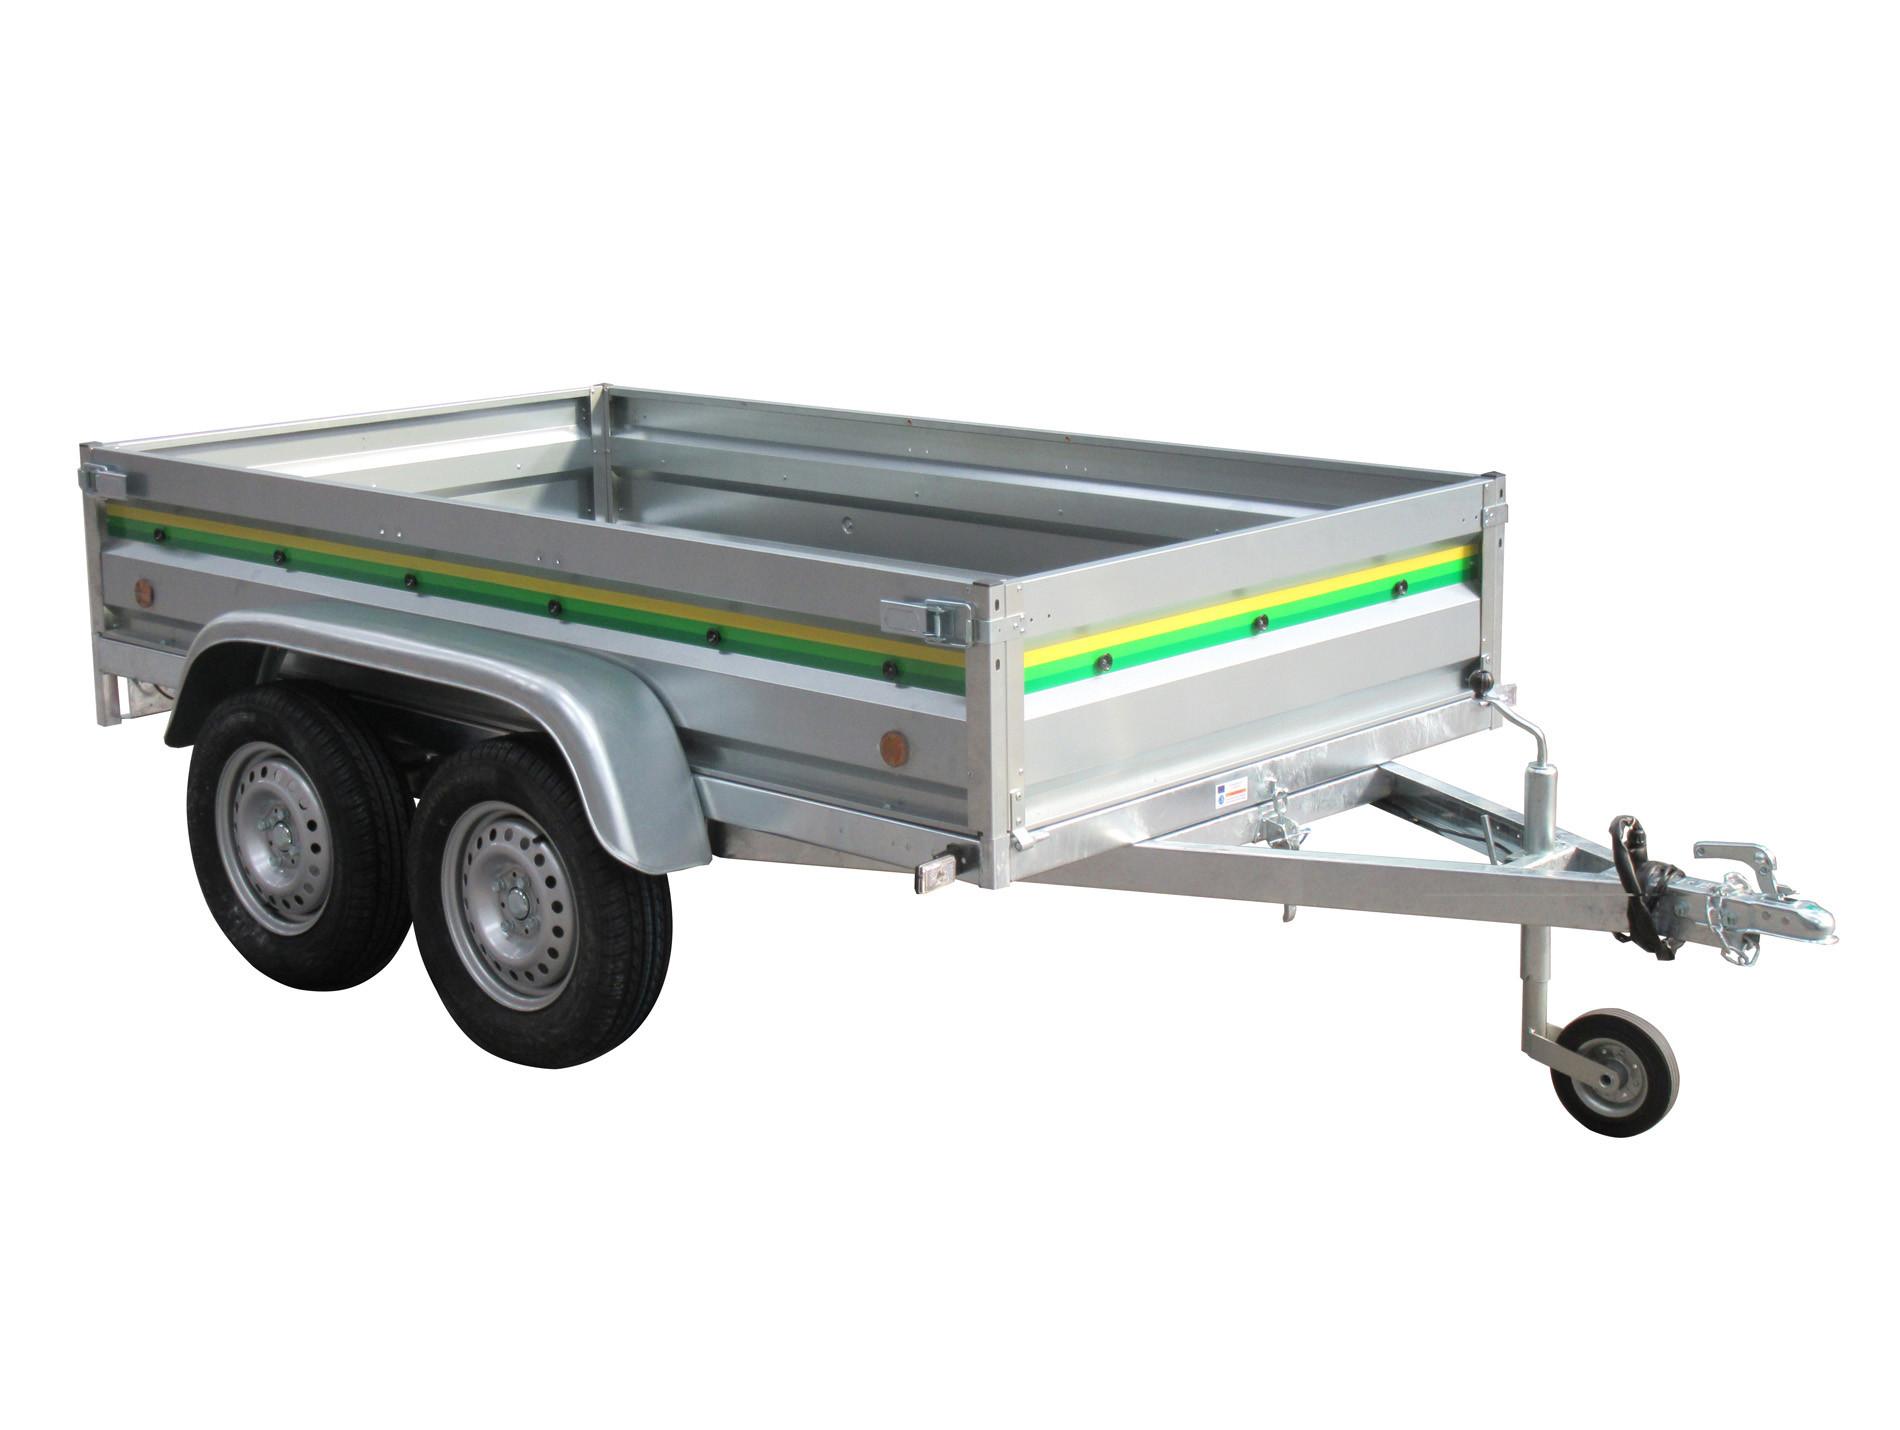 Remorque 2 essieux 2,40m 500kg ESPACE EMERAUDE RUBIS 24